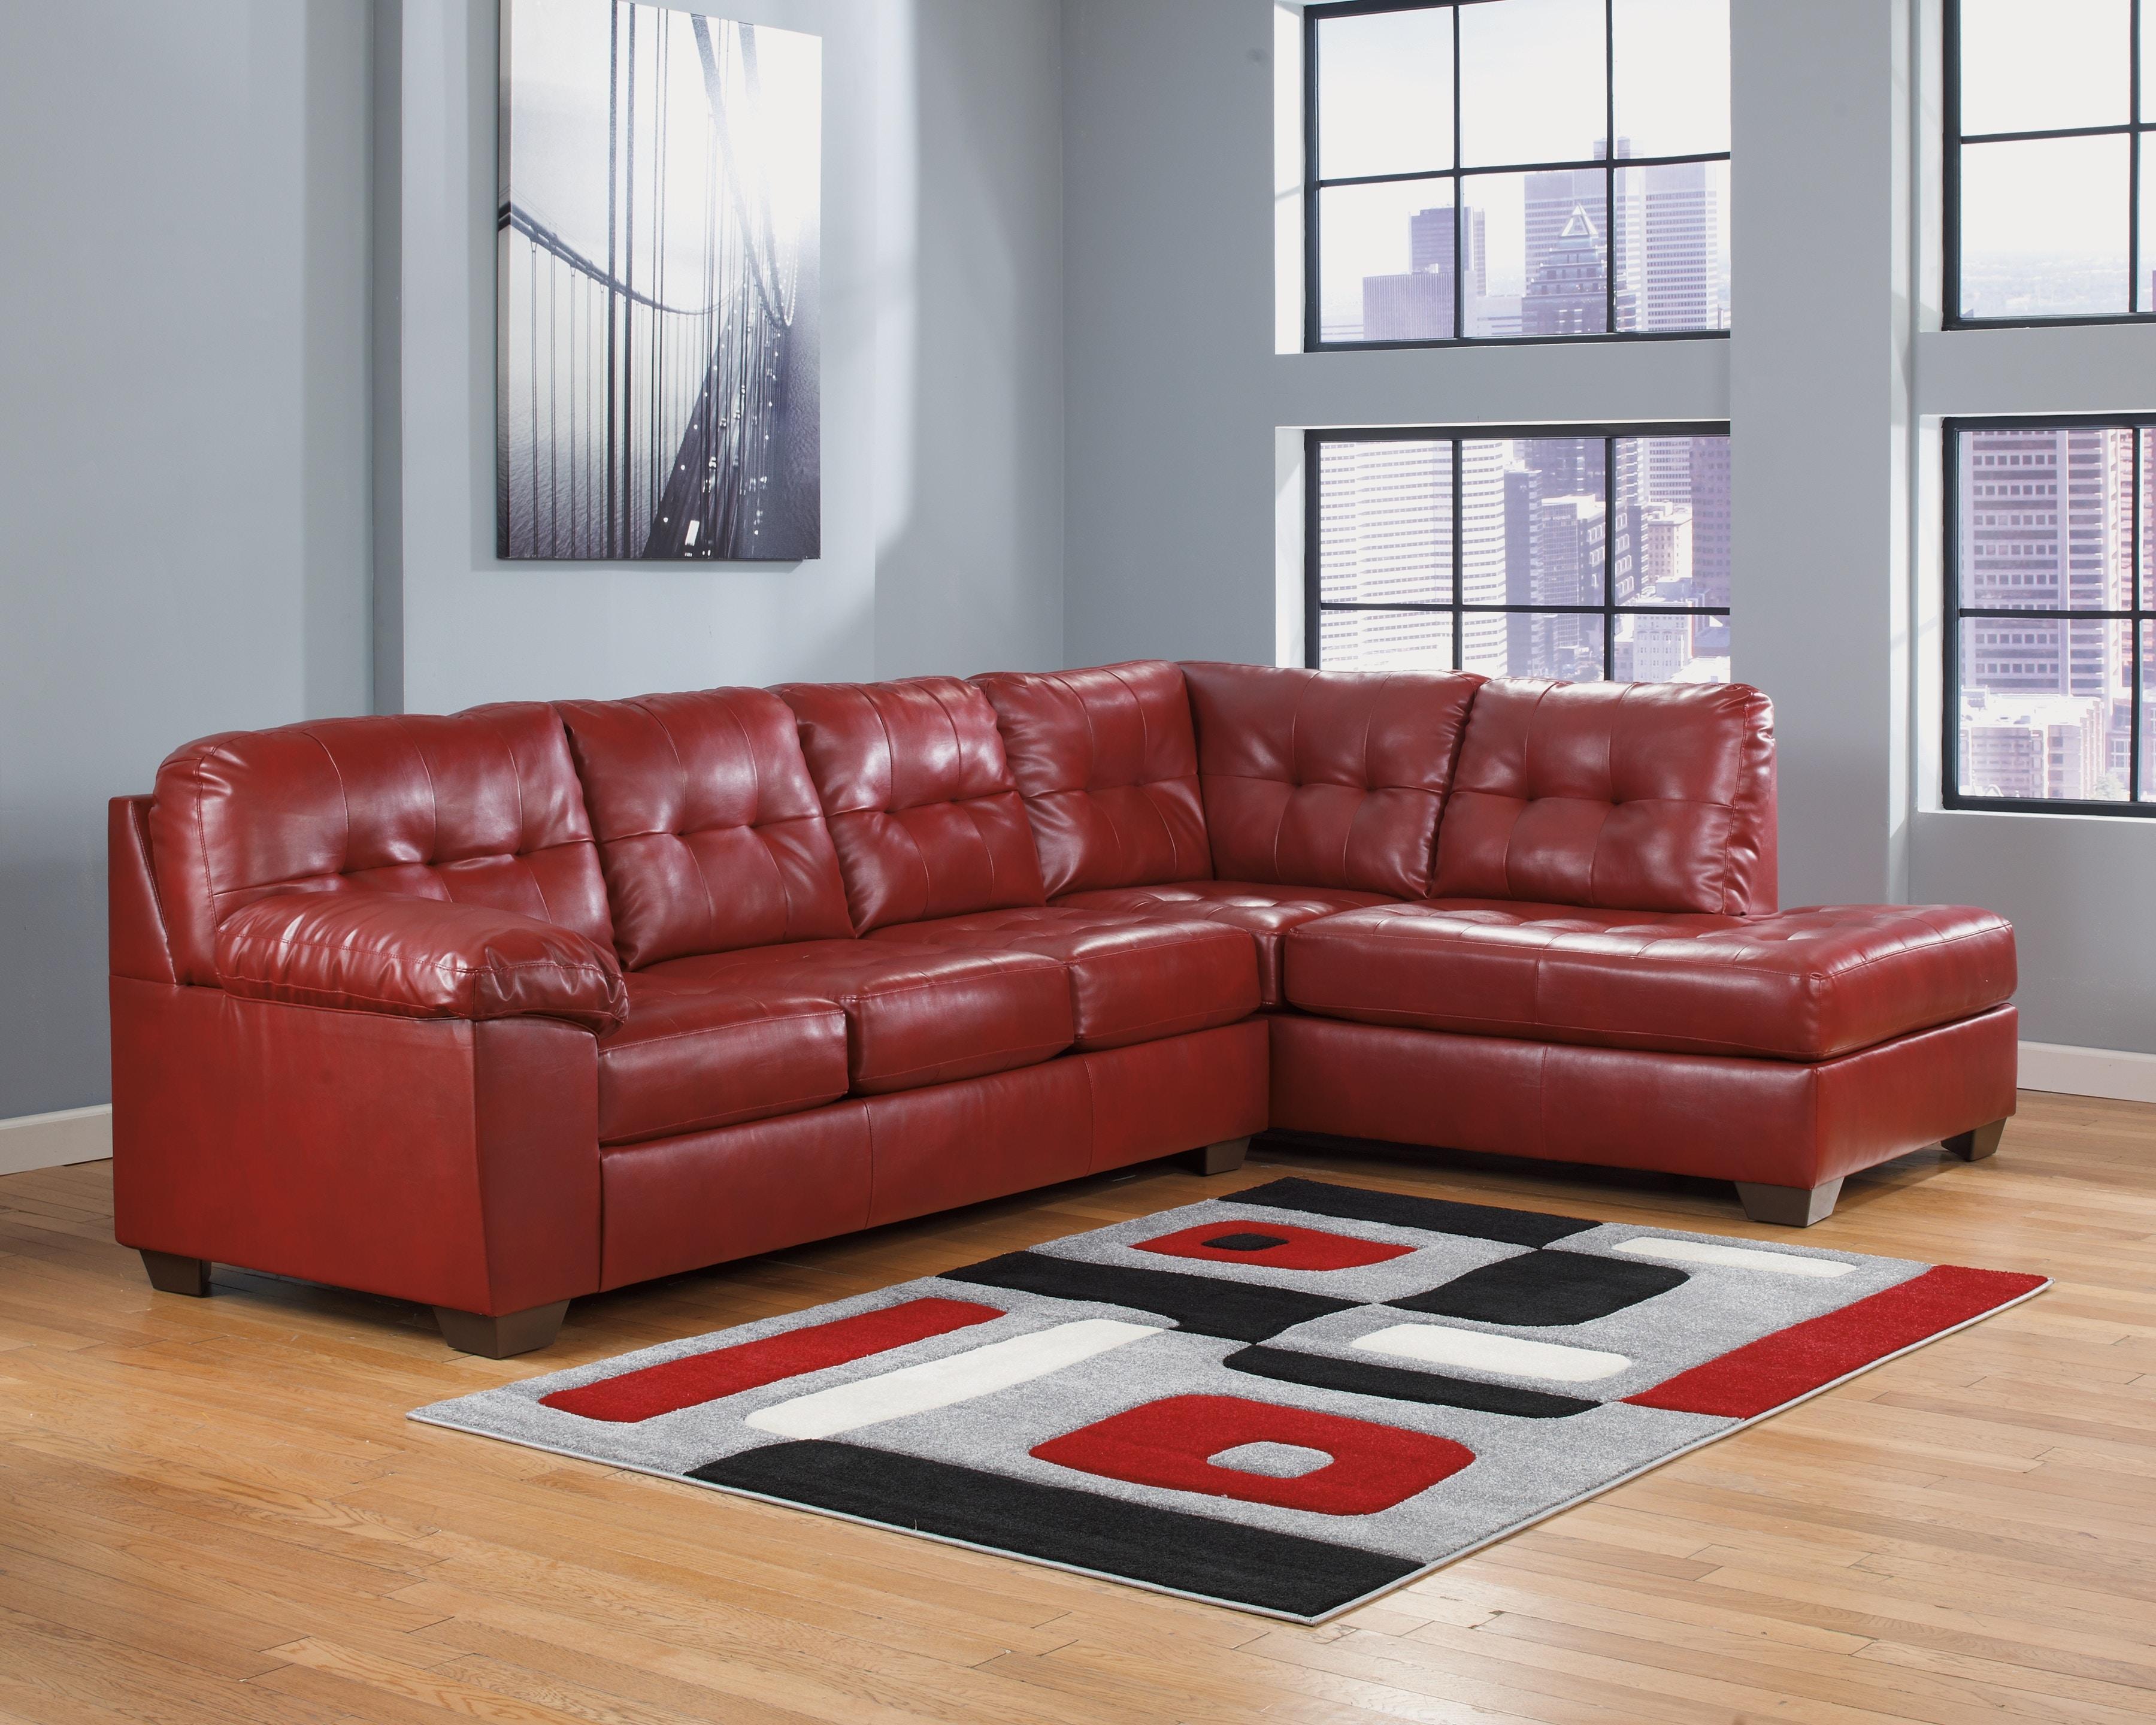 Furniture Stores Yuba City Signature Design By Living Room Laf Sofa